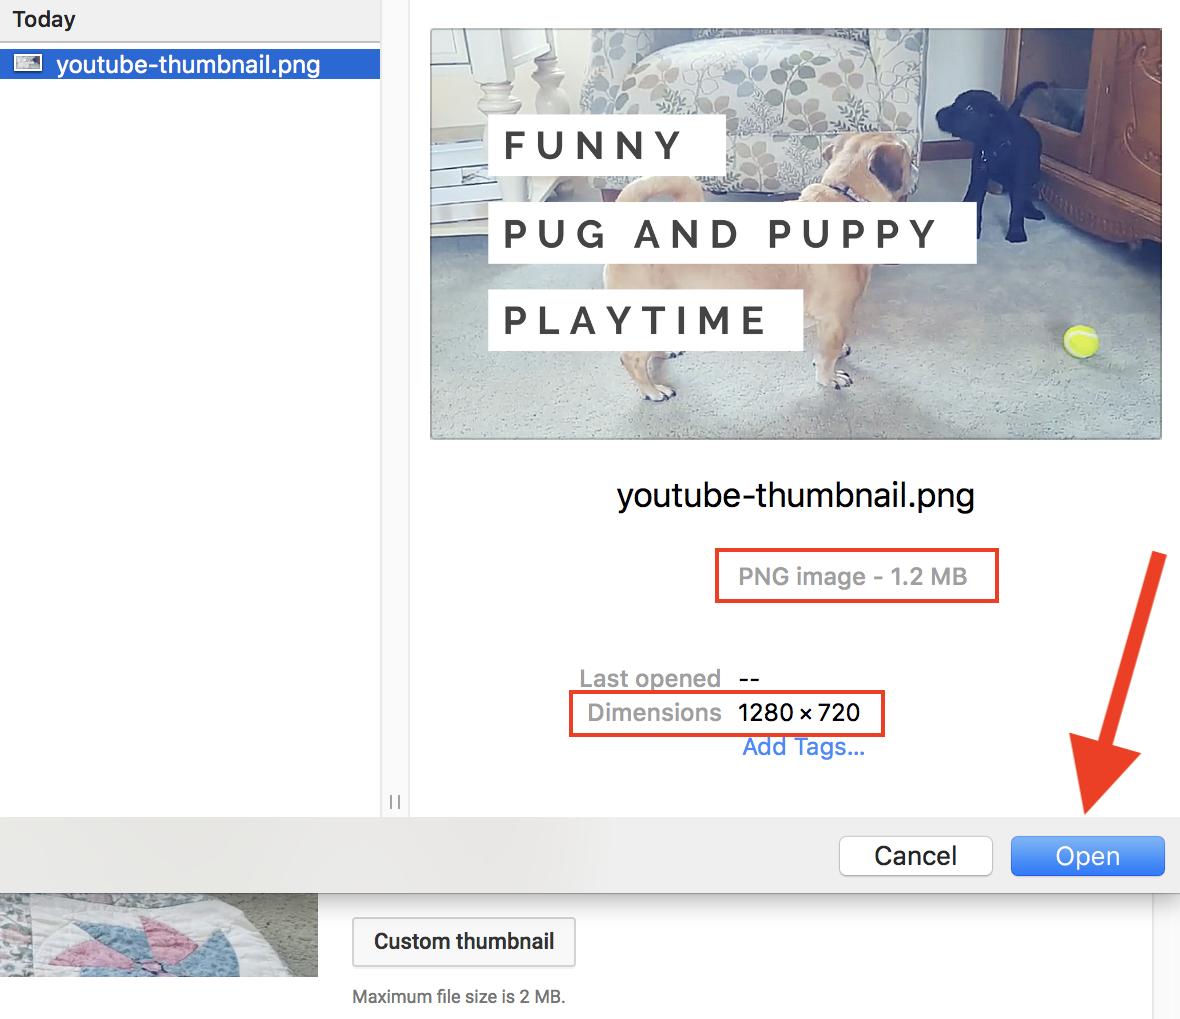 youtube-thumbnail-dimensions